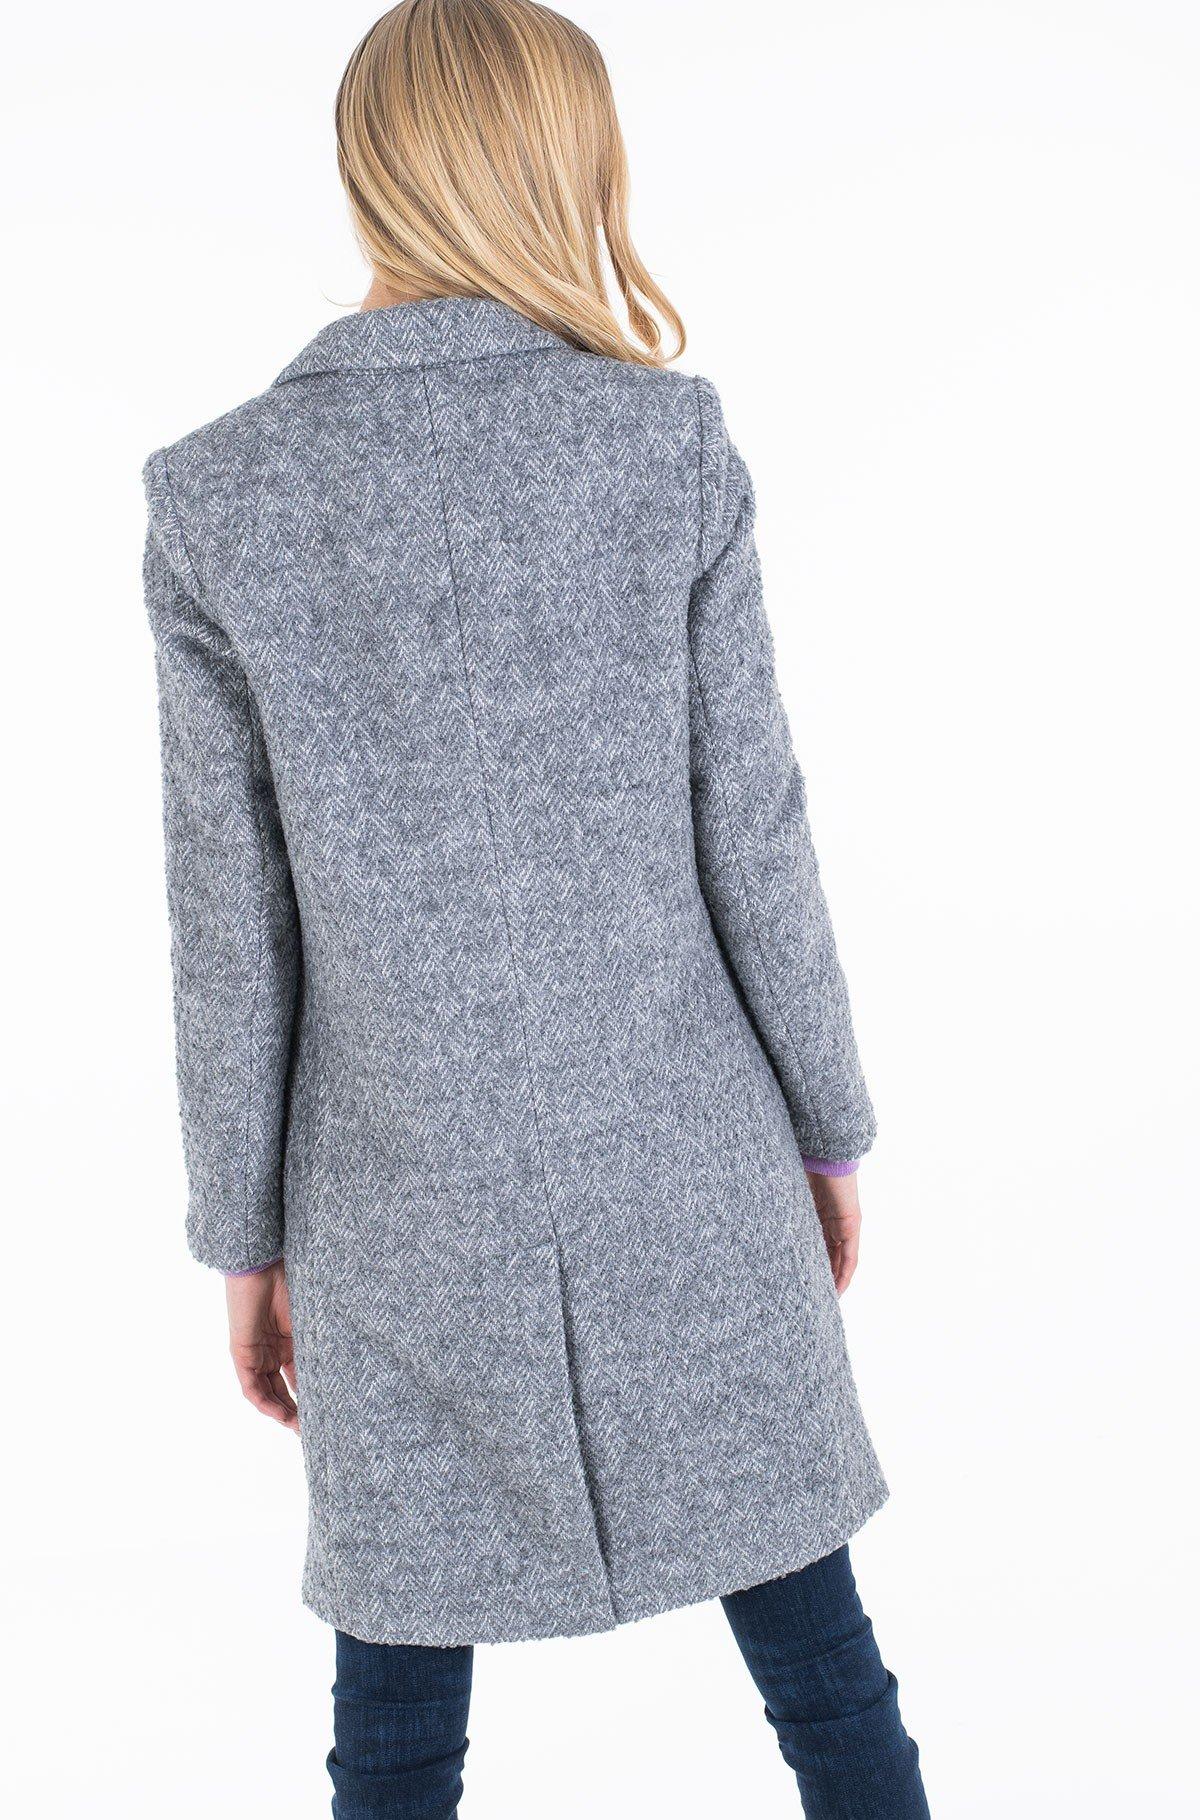 Coat NATASHA TEXTURED CLASSIC COAT-full-3